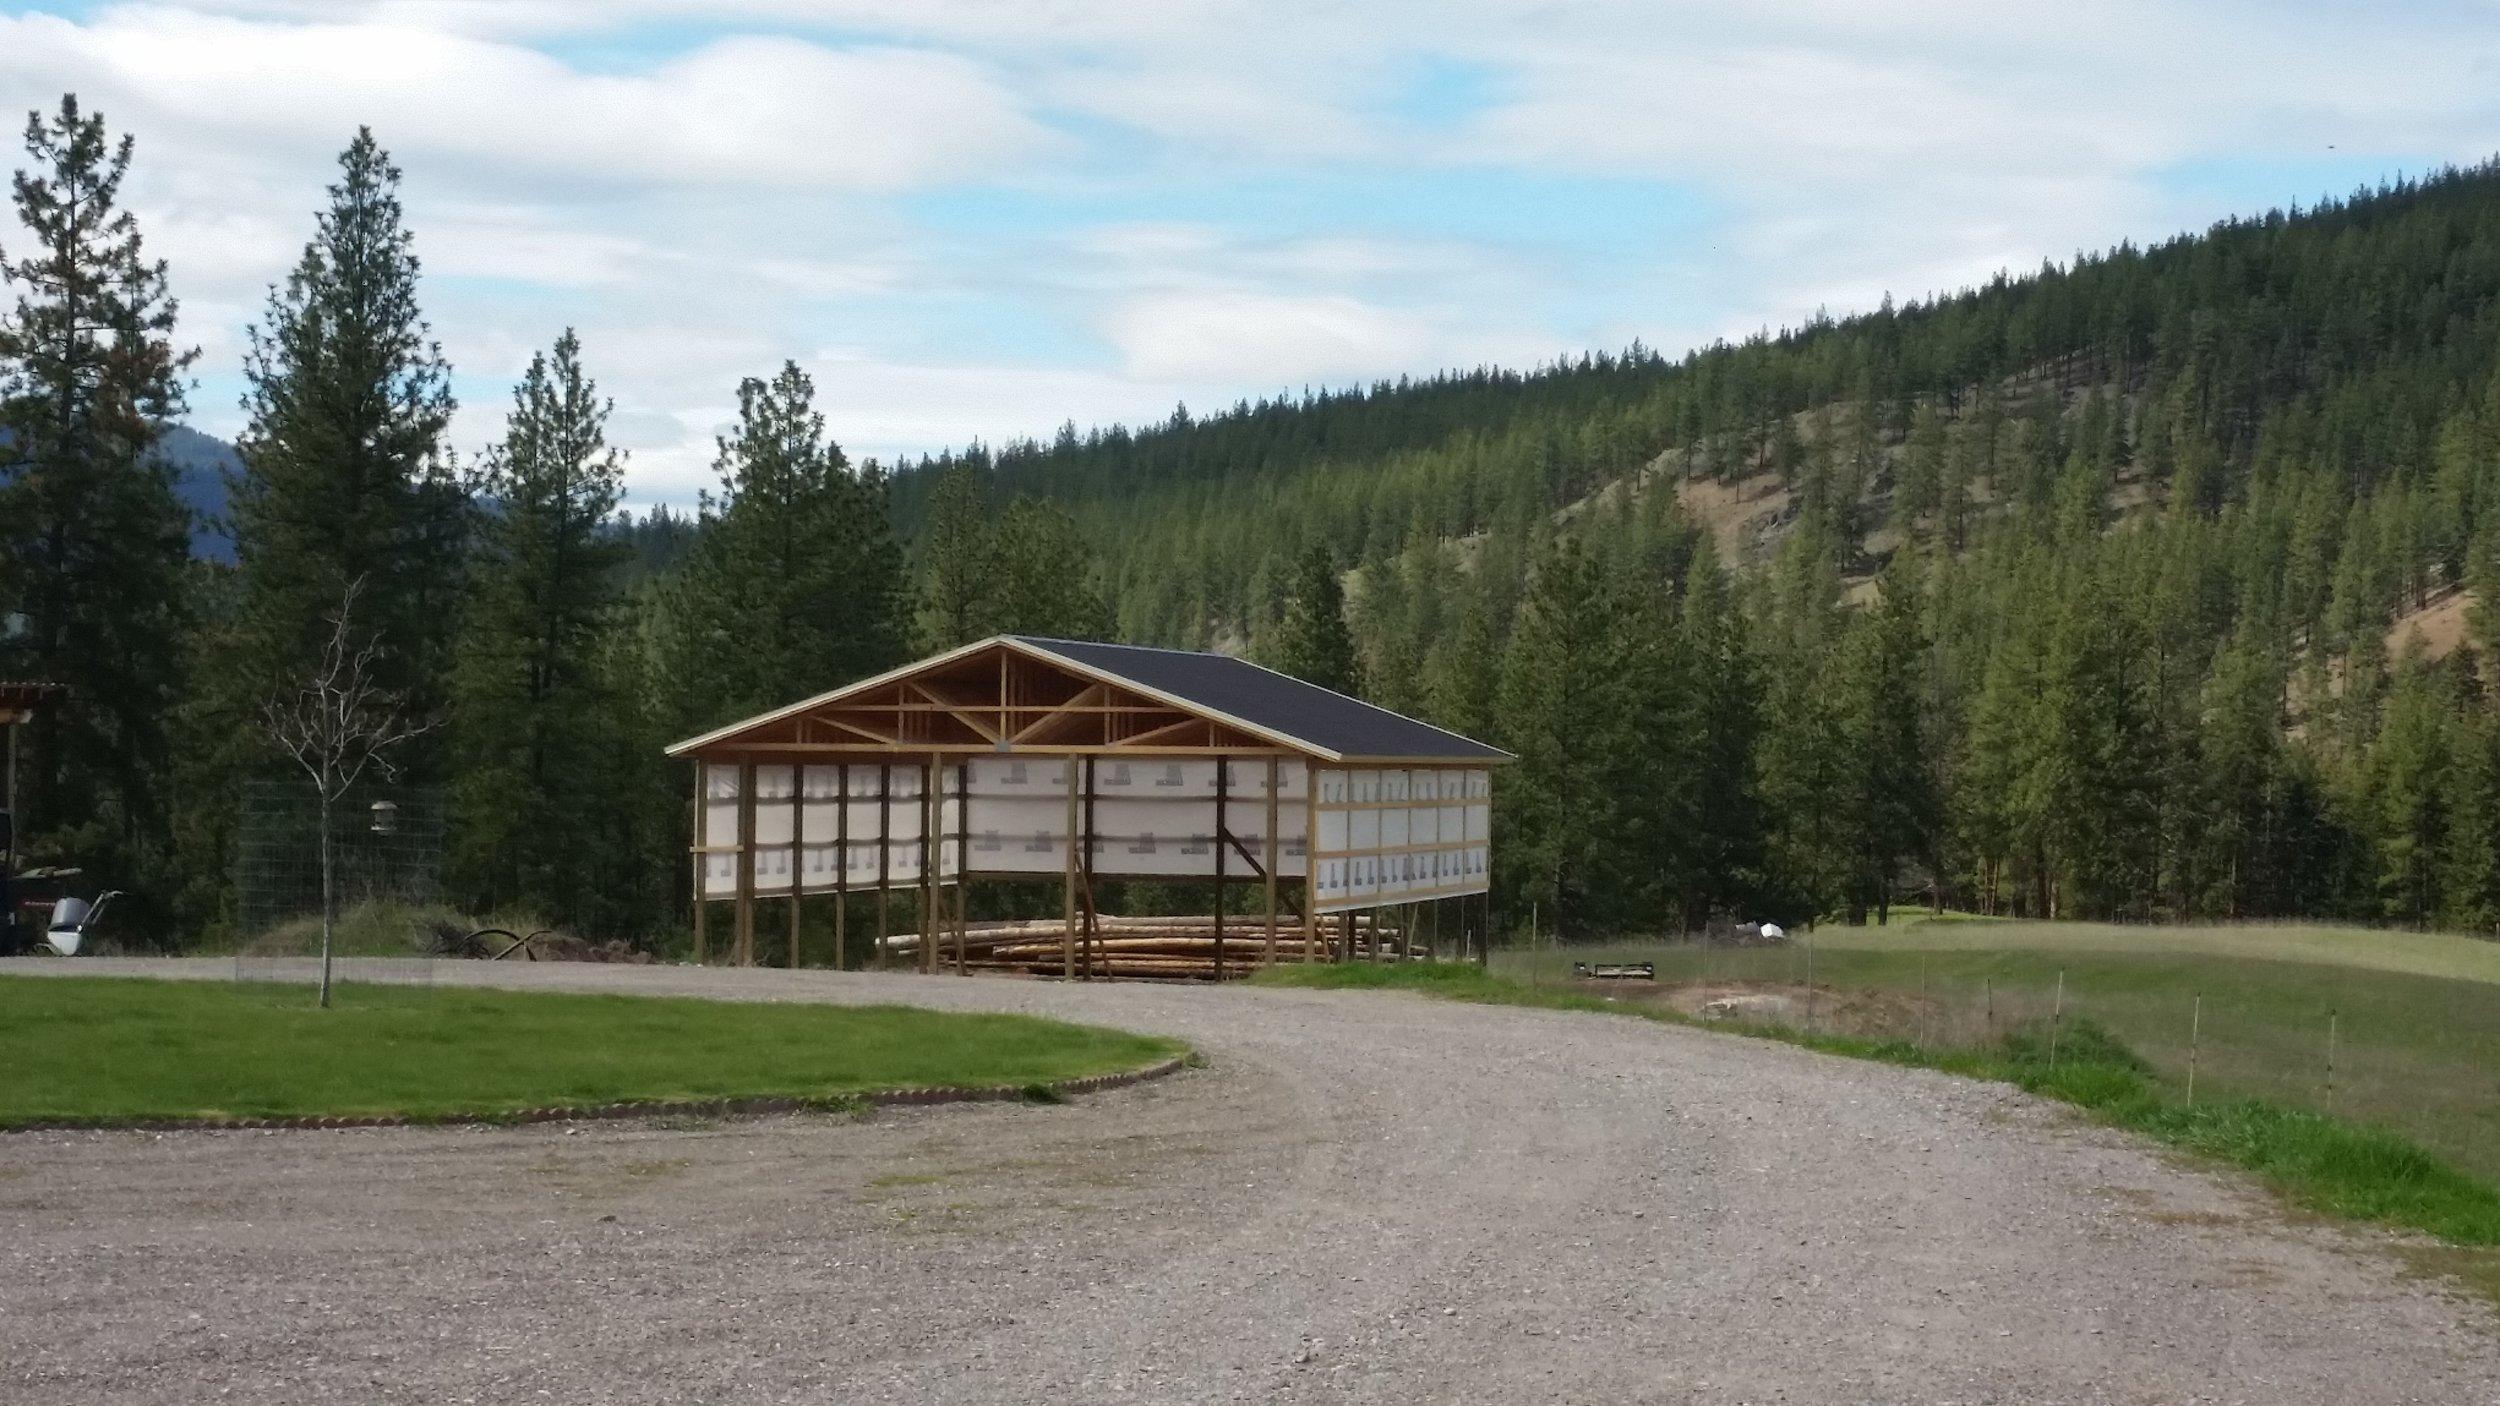 pole barn with walls